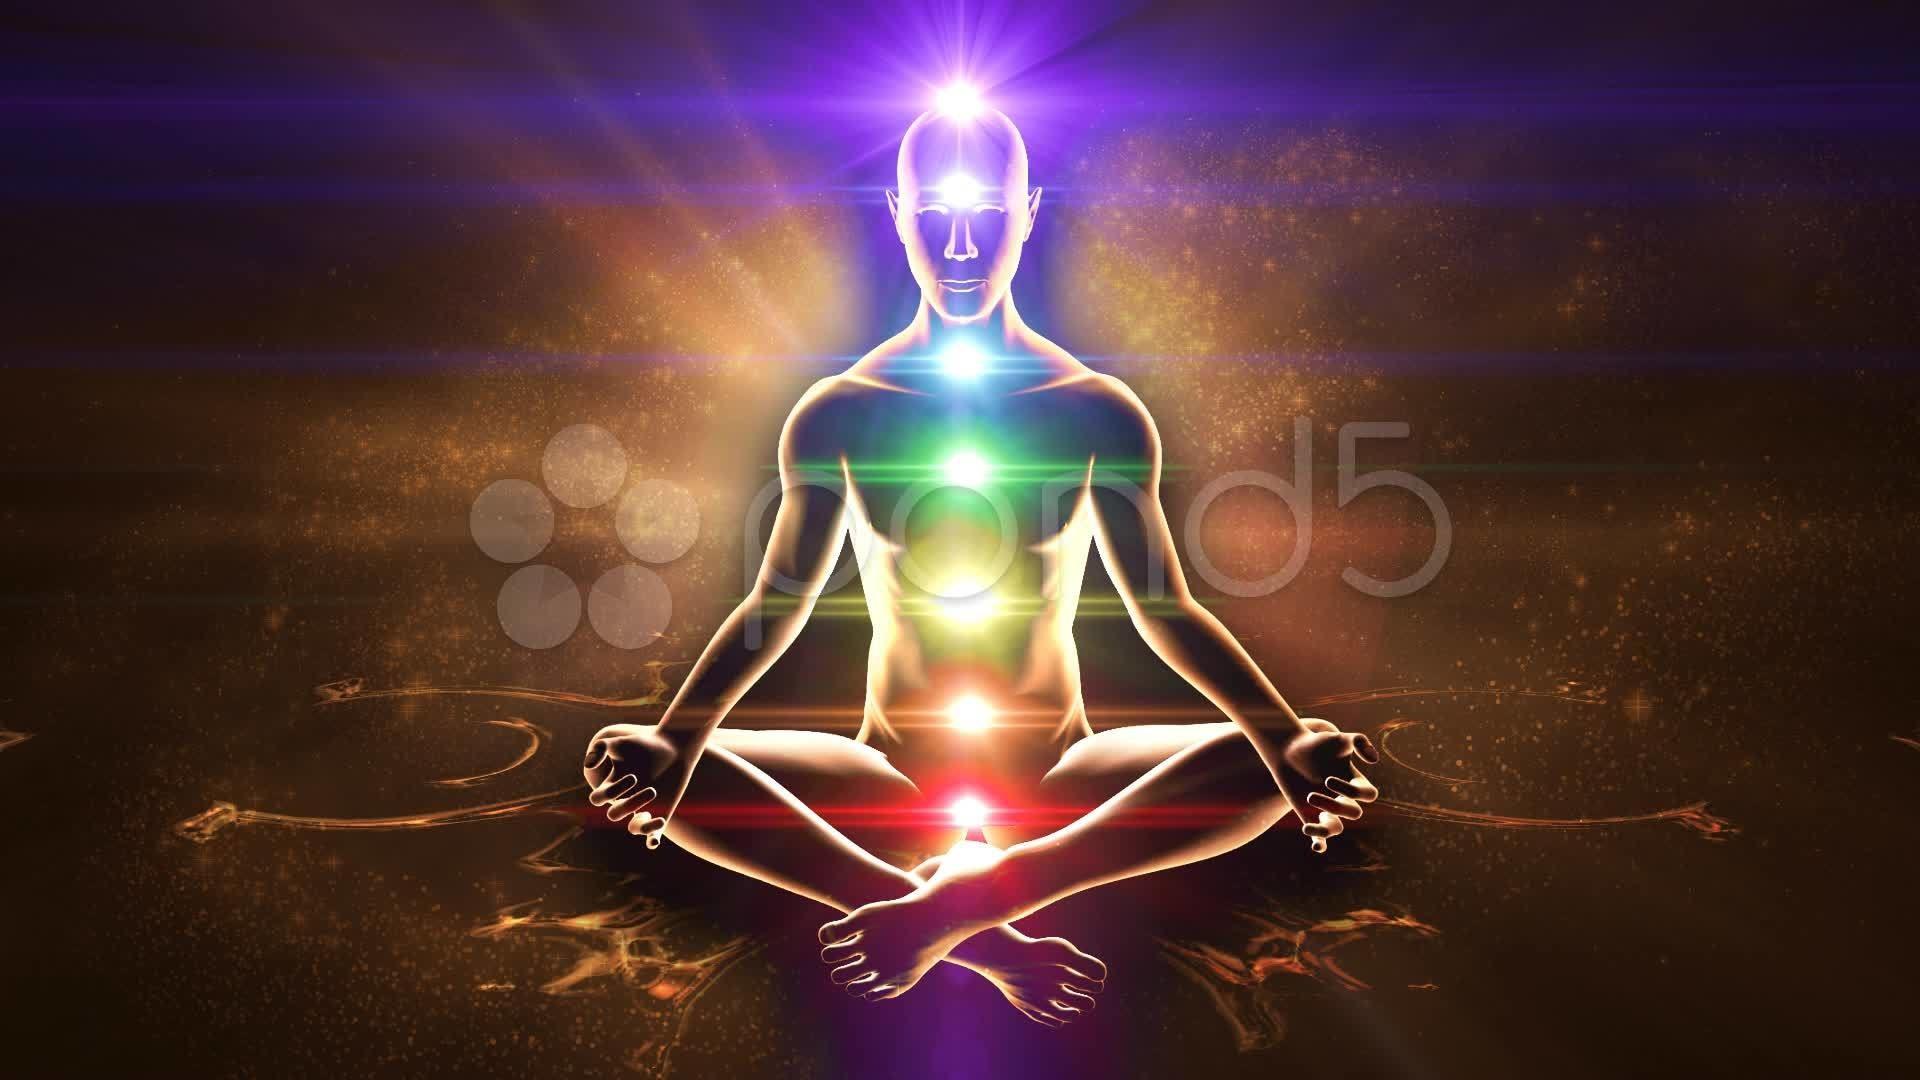 Chakra Meditation Cleansing Balancing amp Healing with